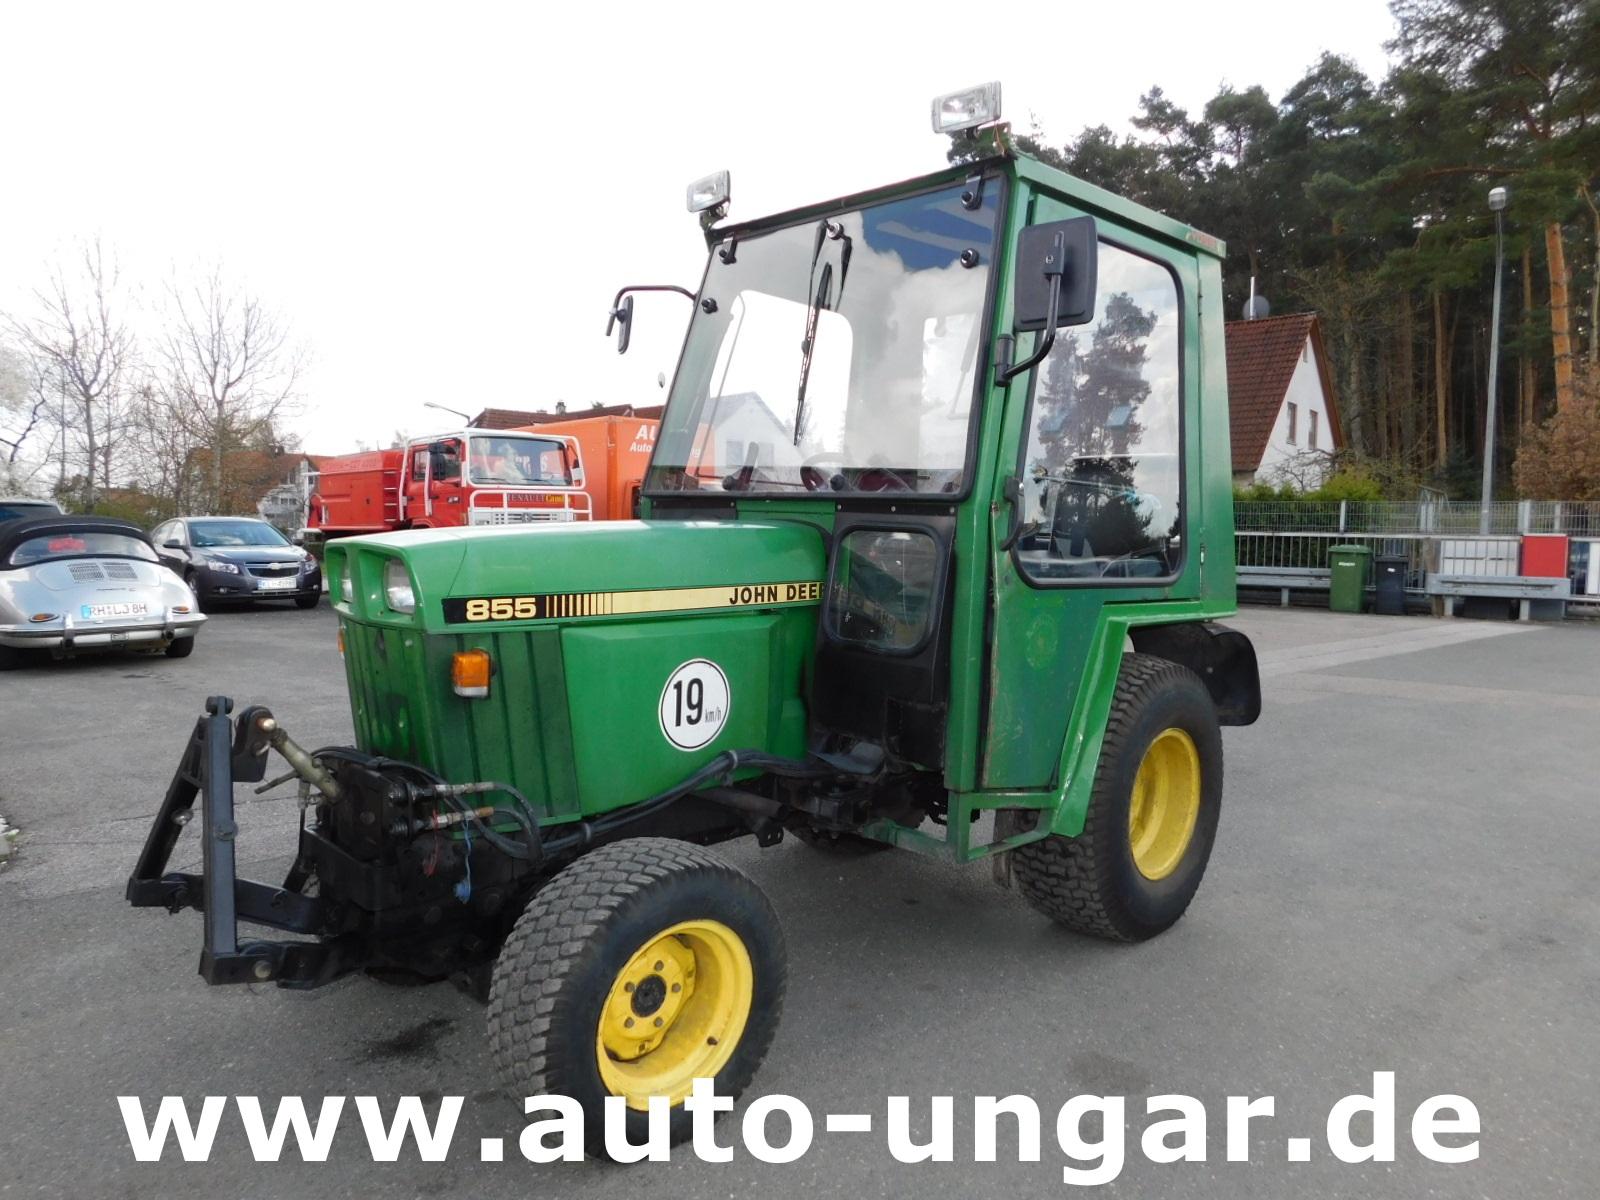 Used street sweeper,garbage trucks,fire trucks,ambulance for